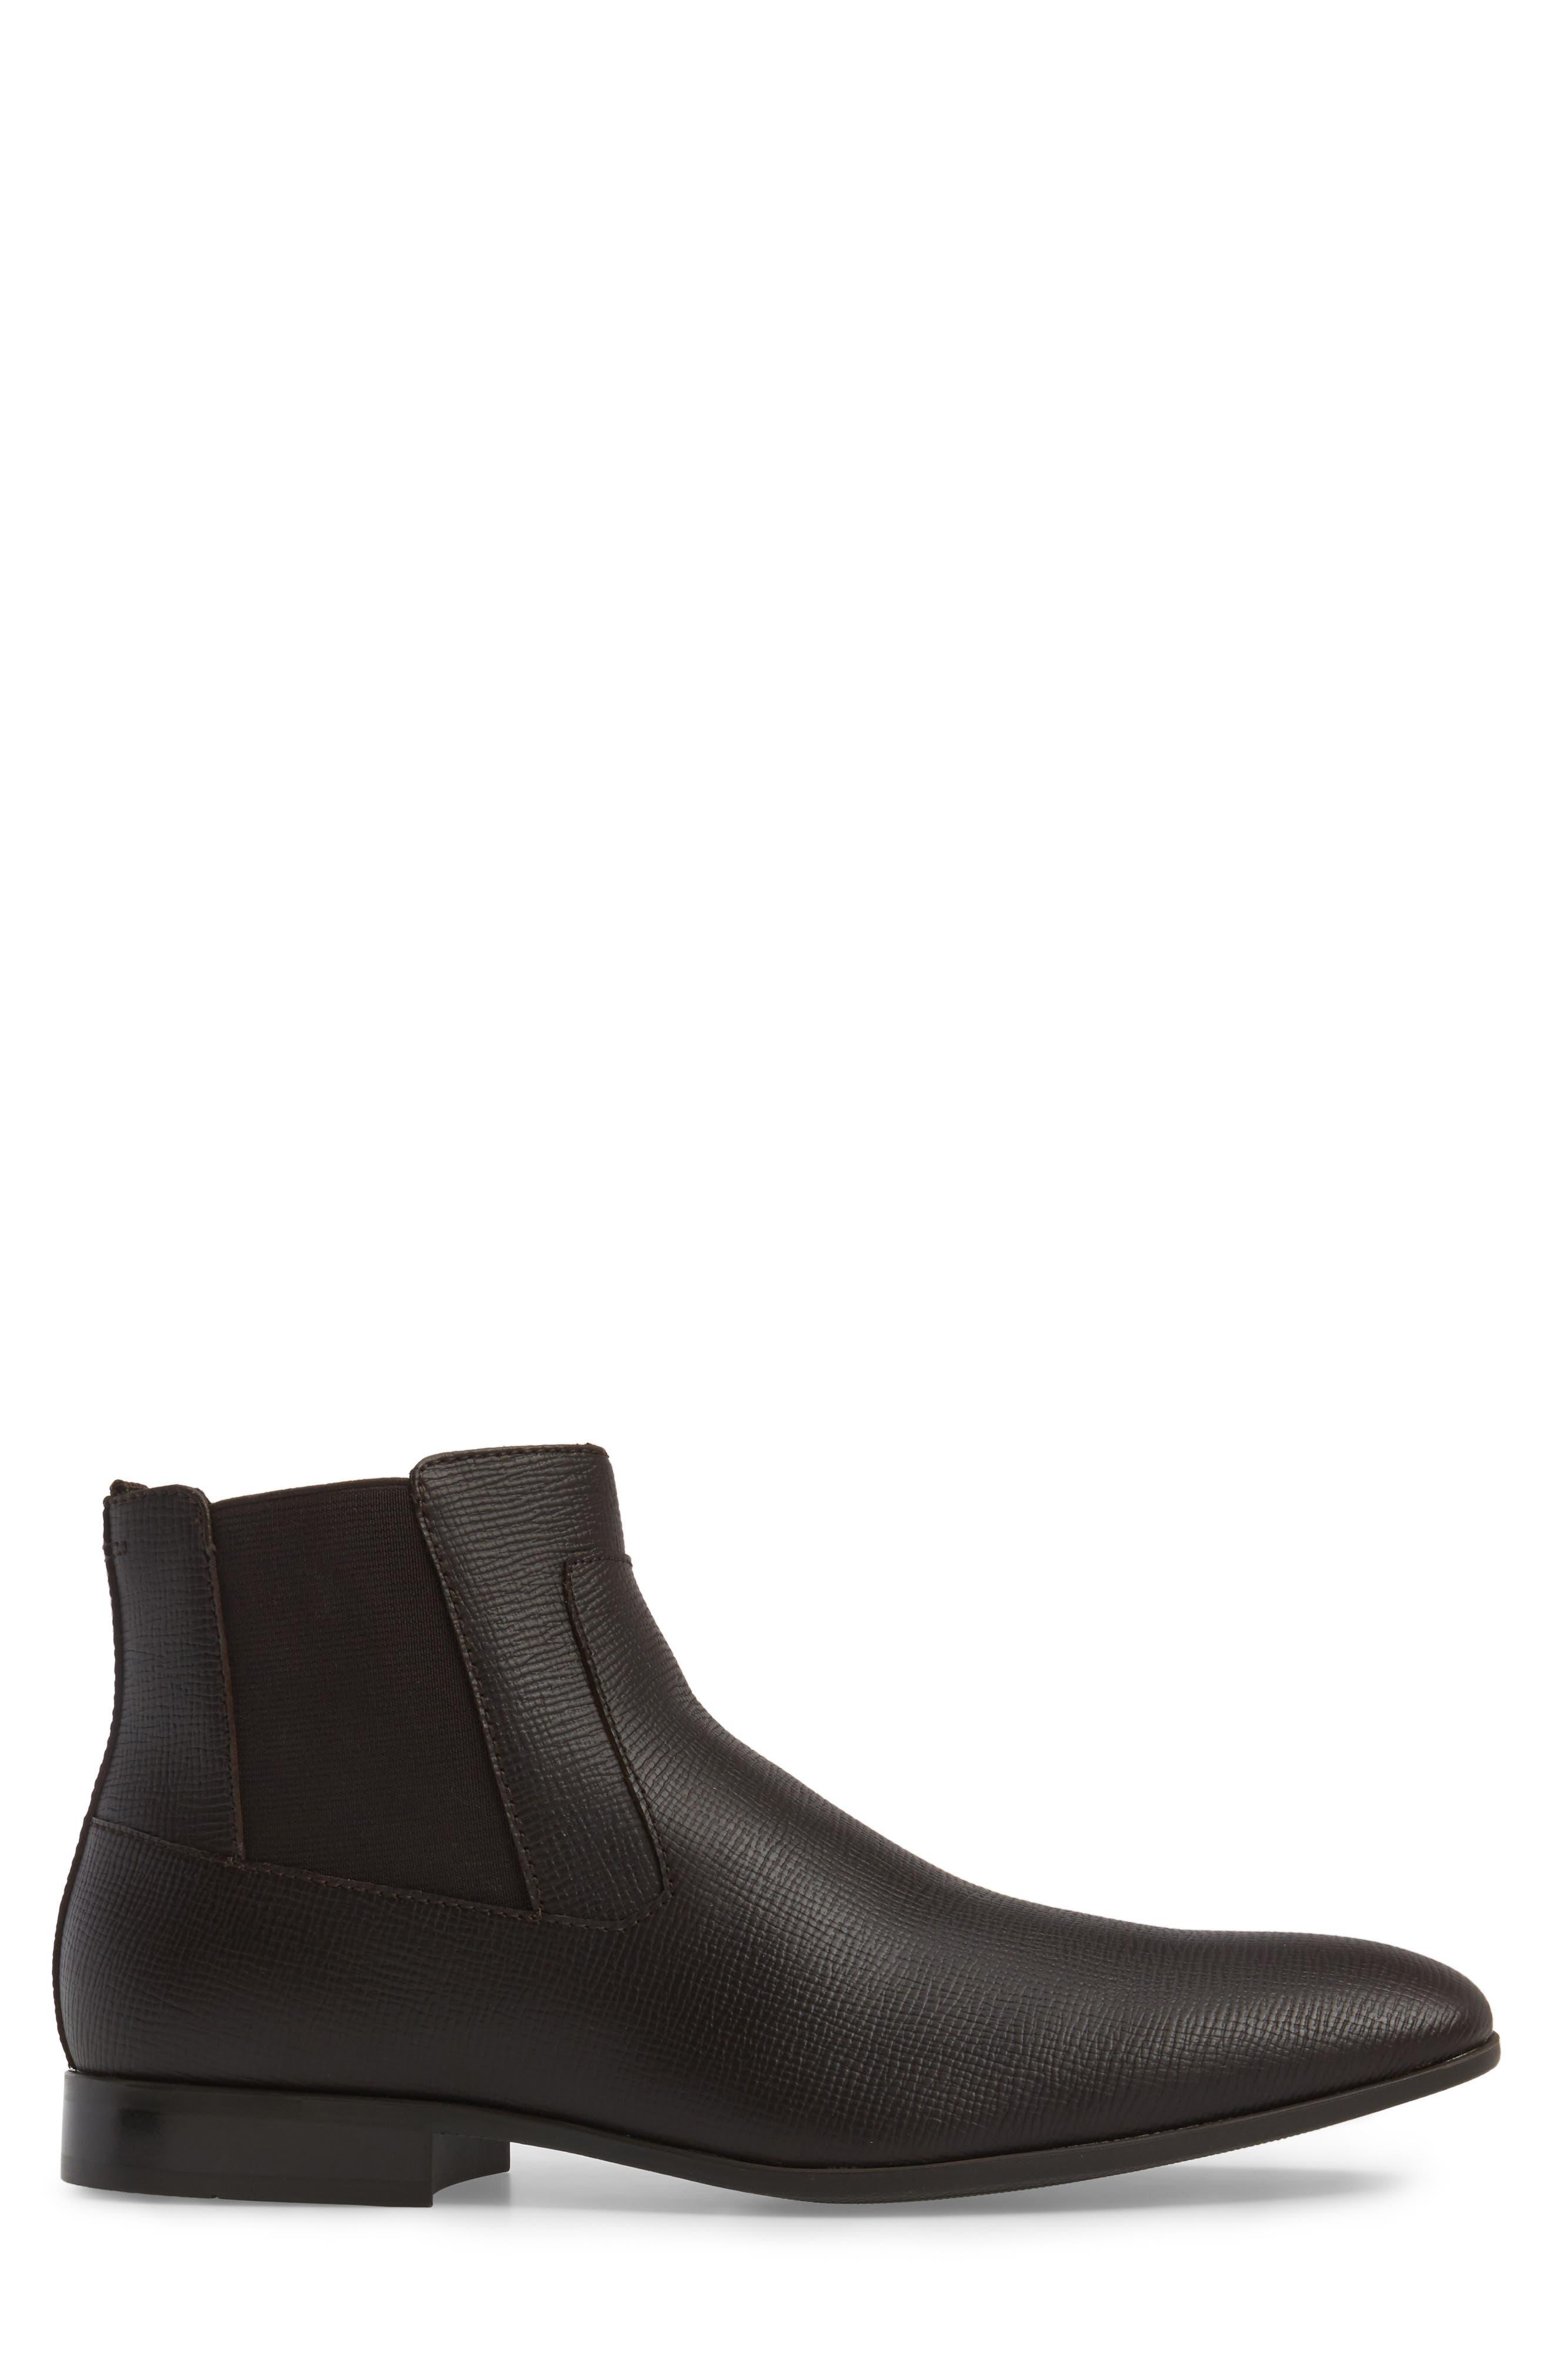 Christoff Chelsea Boot,                             Alternate thumbnail 3, color,                             Dark Brown Epi Leather